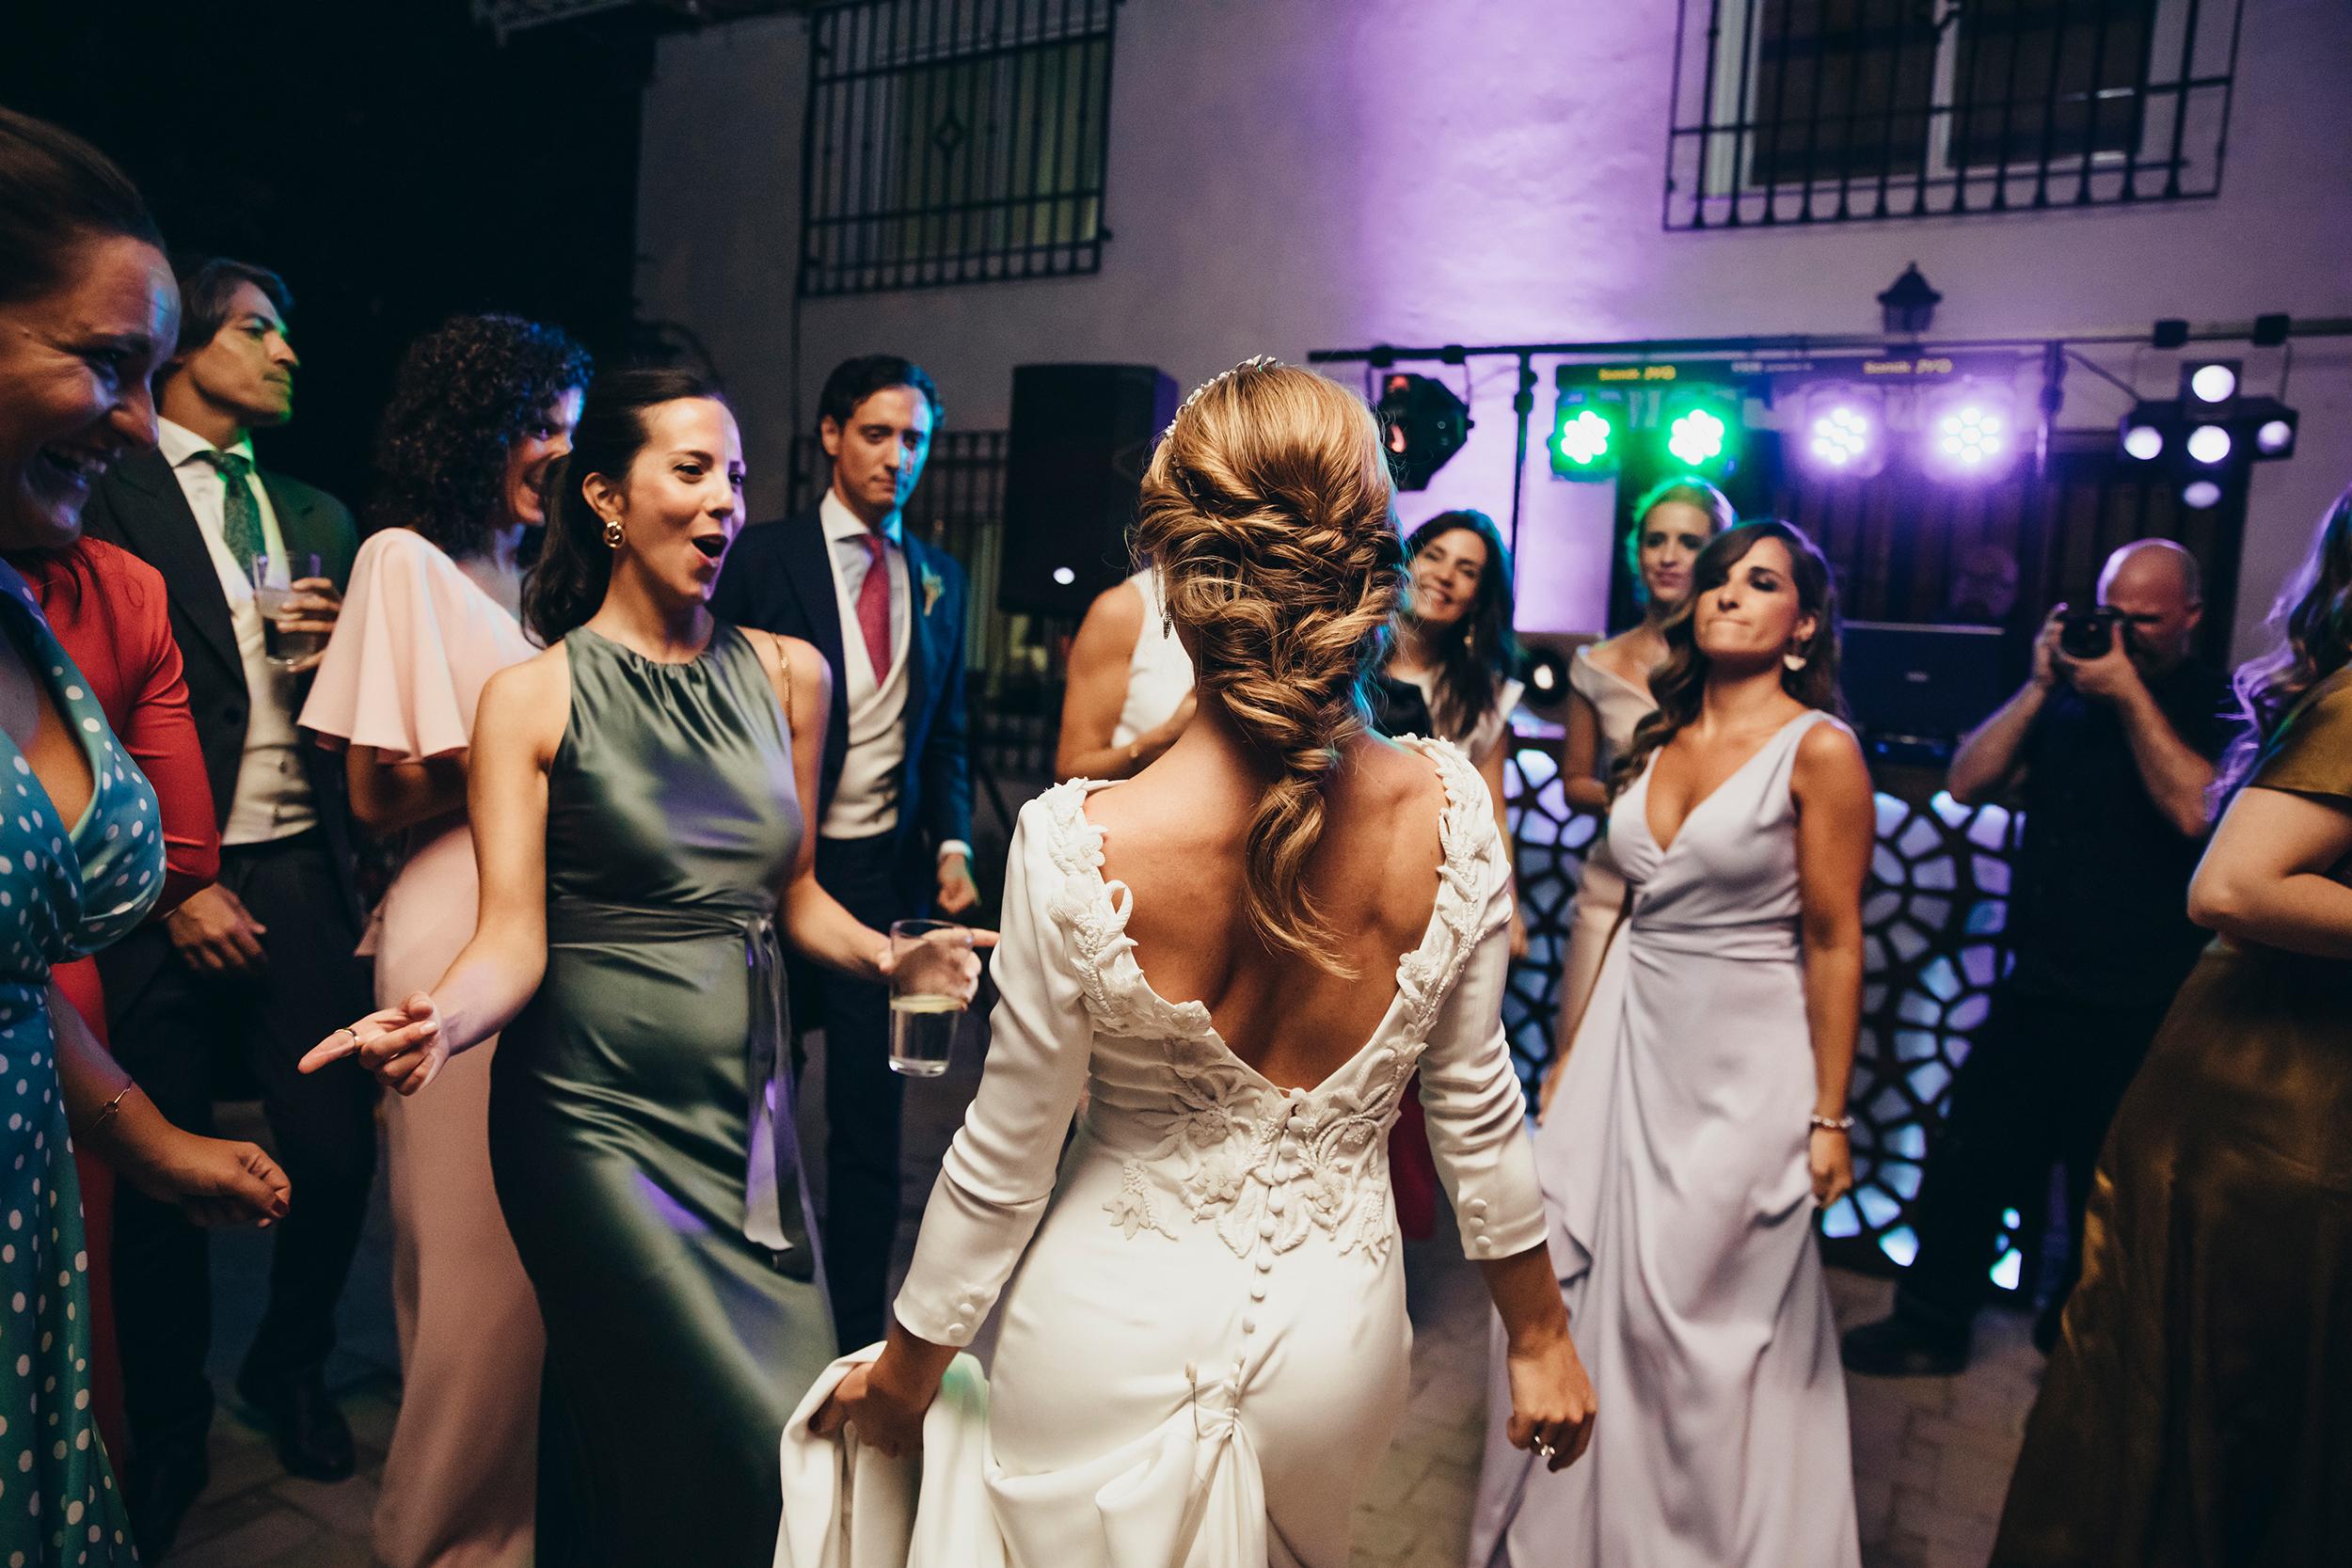 fotografo-bodas-granada-catedral-sagrario-jose-reyes_086.jpg